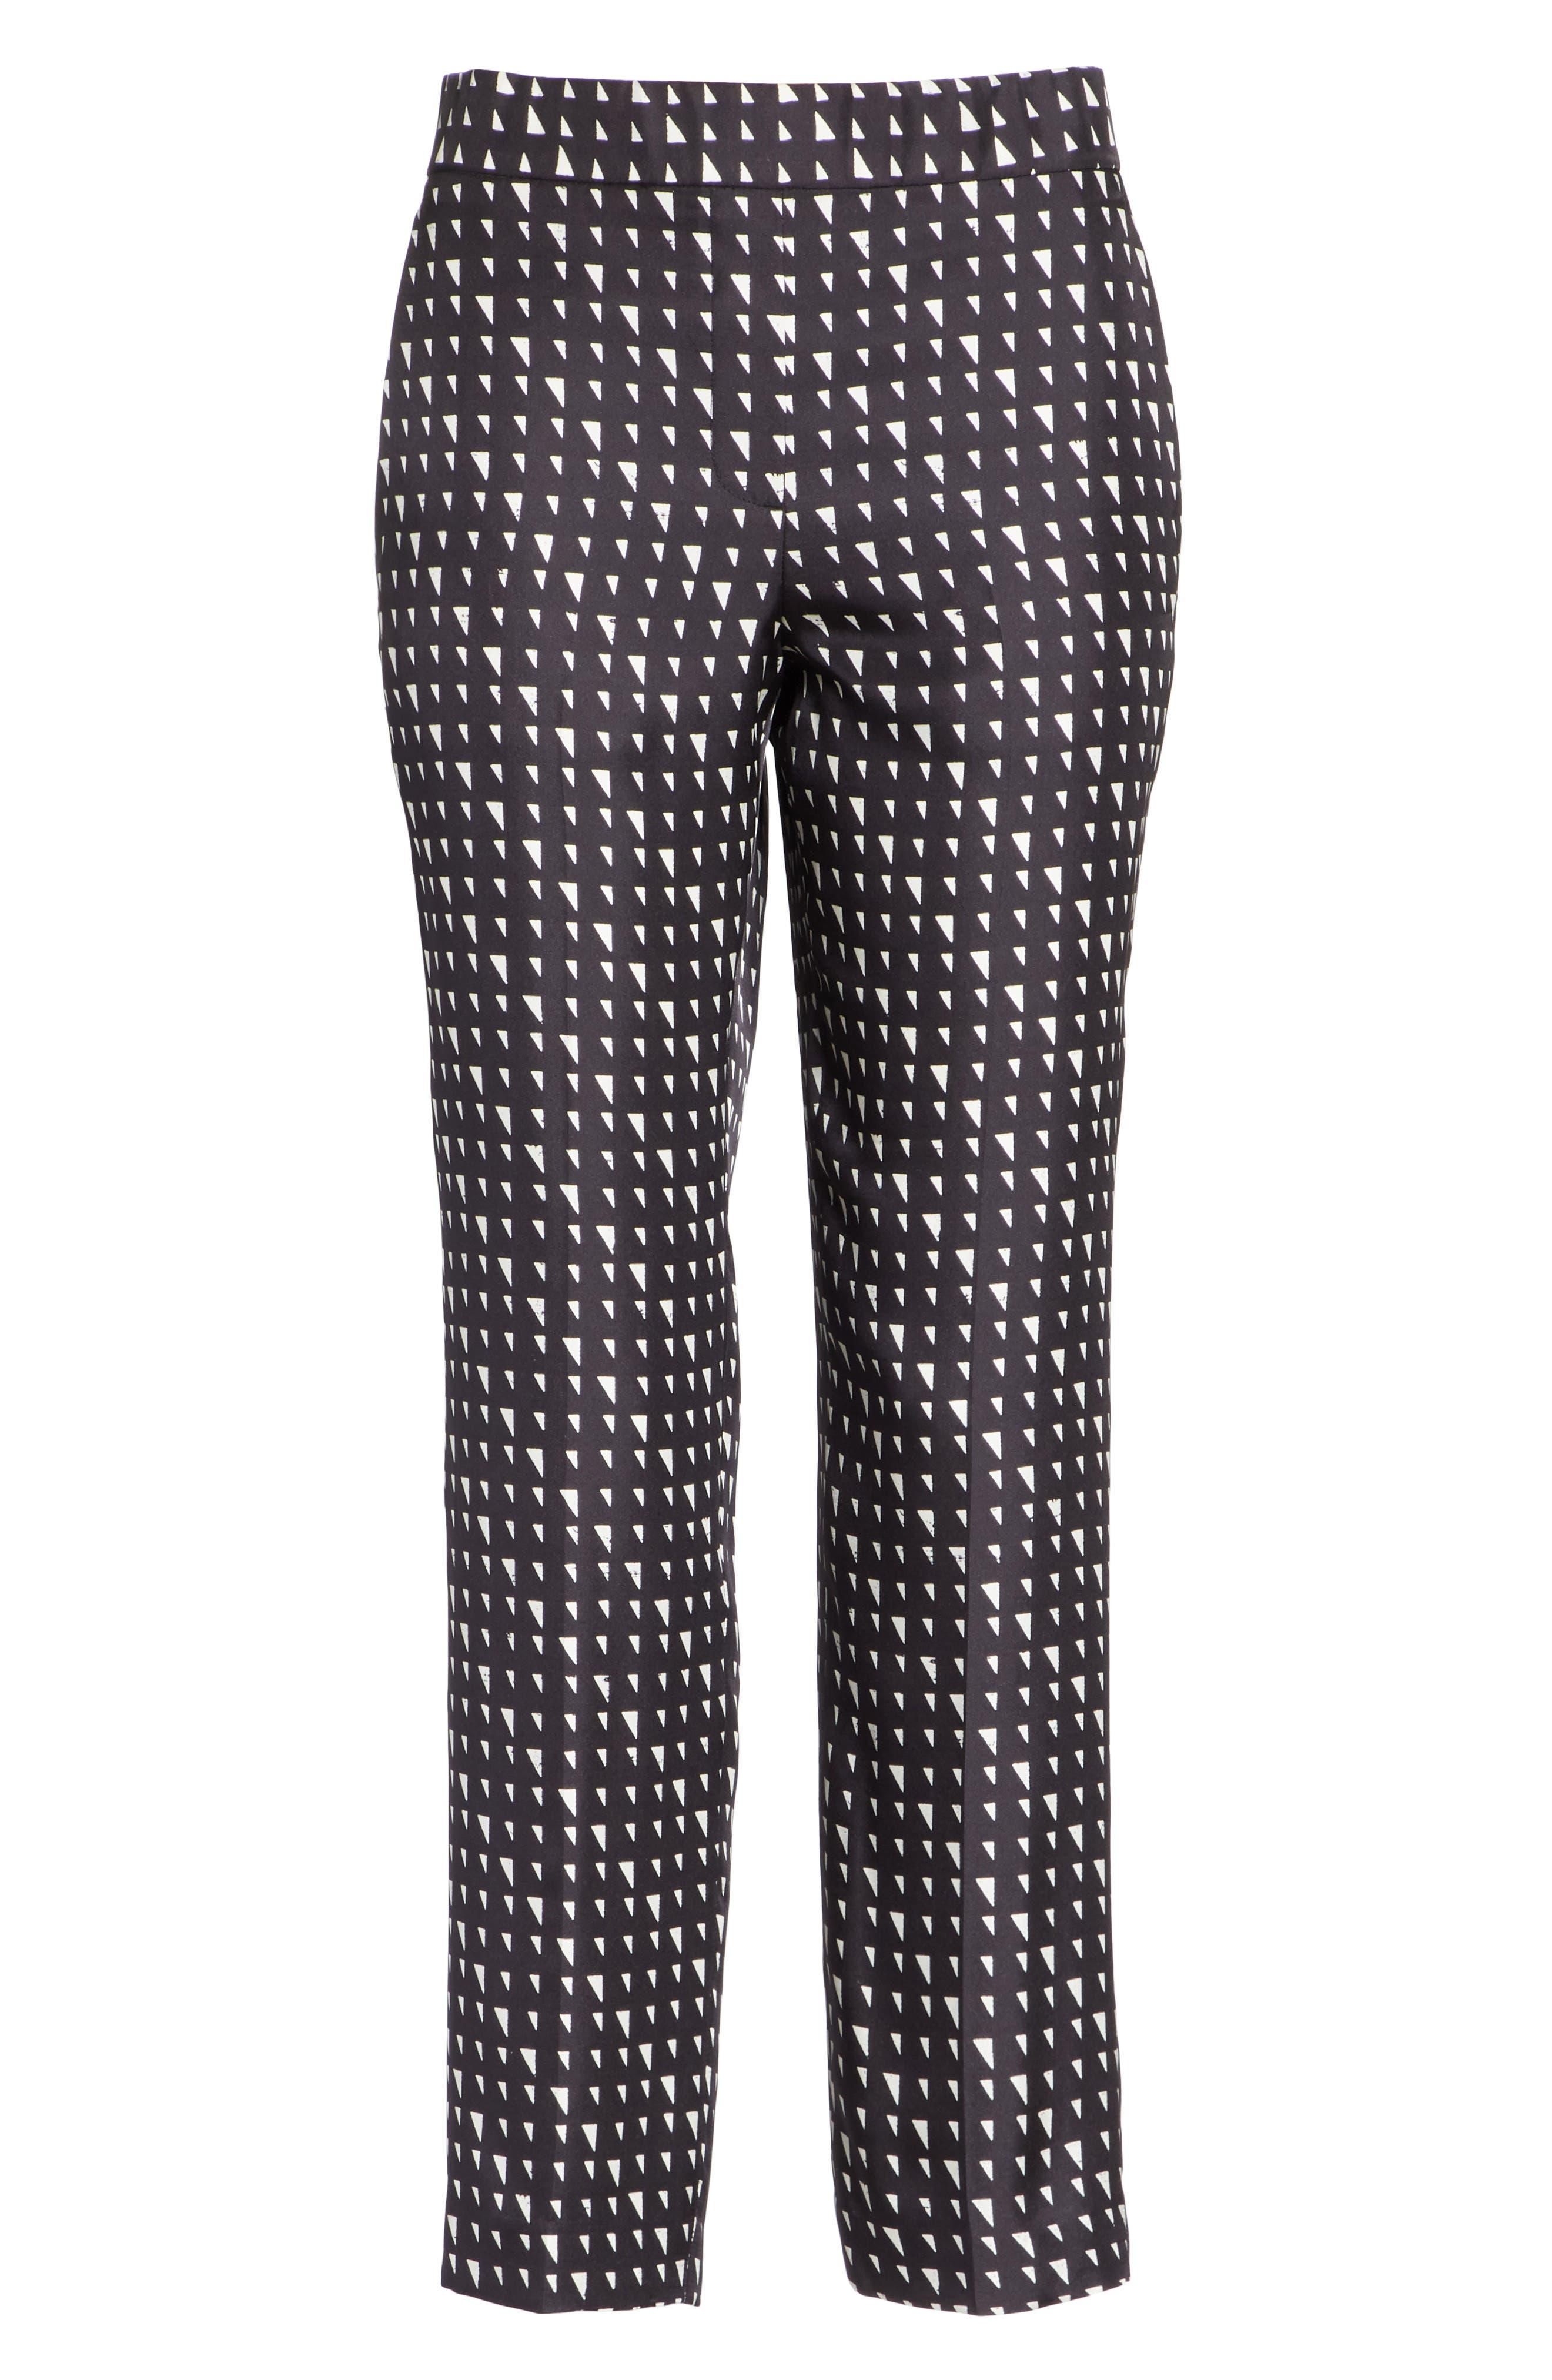 Pull On Silk Trousers,                             Alternate thumbnail 6, color,                             Black/ Ivory